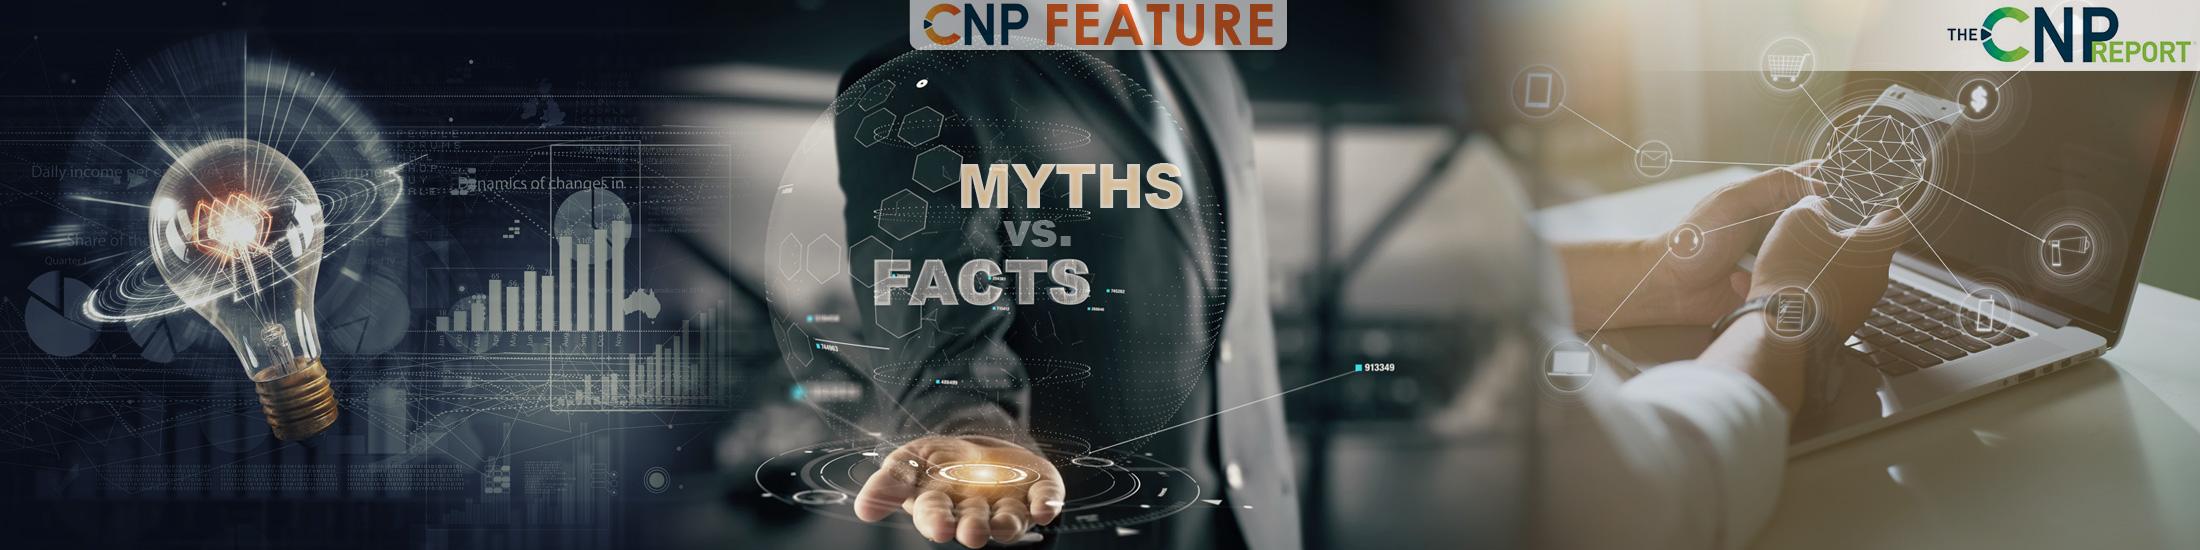 3 Cross-Border E-Commerce Myths Debunked